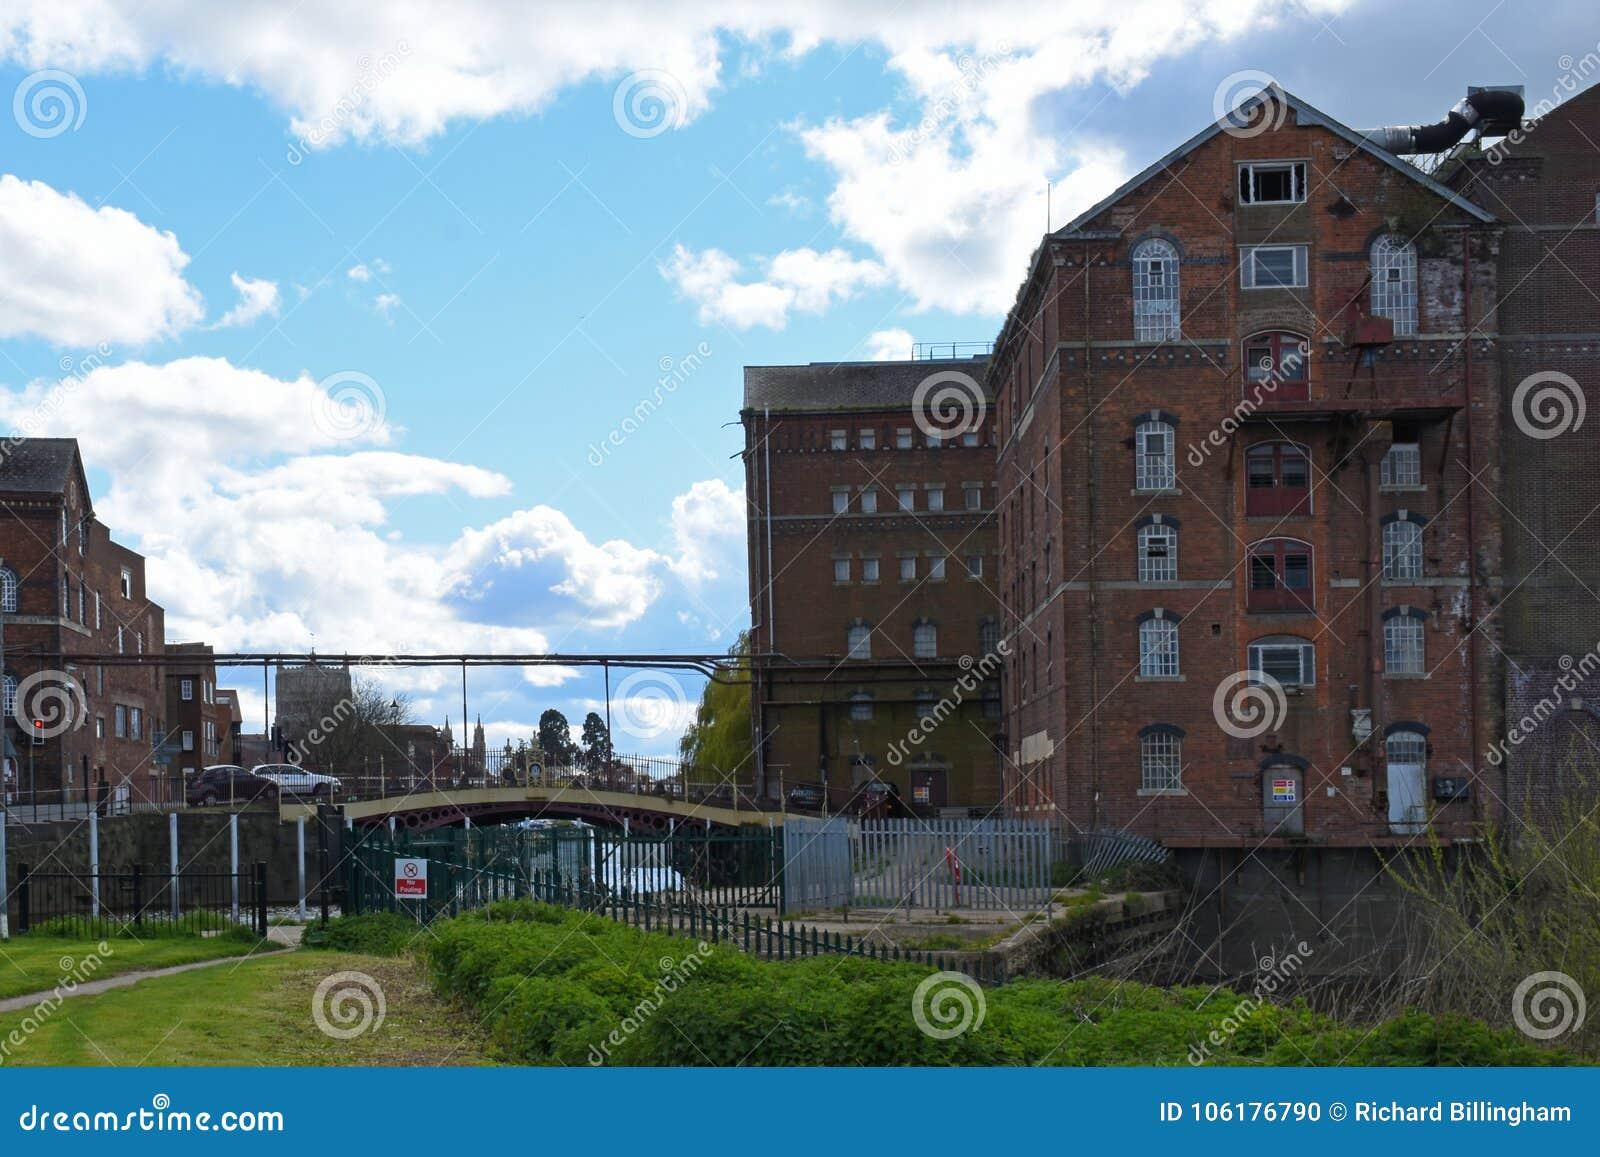 Disused Healing`s Flour Mill, Tewkesbury, Gloucestershire, UK Stock